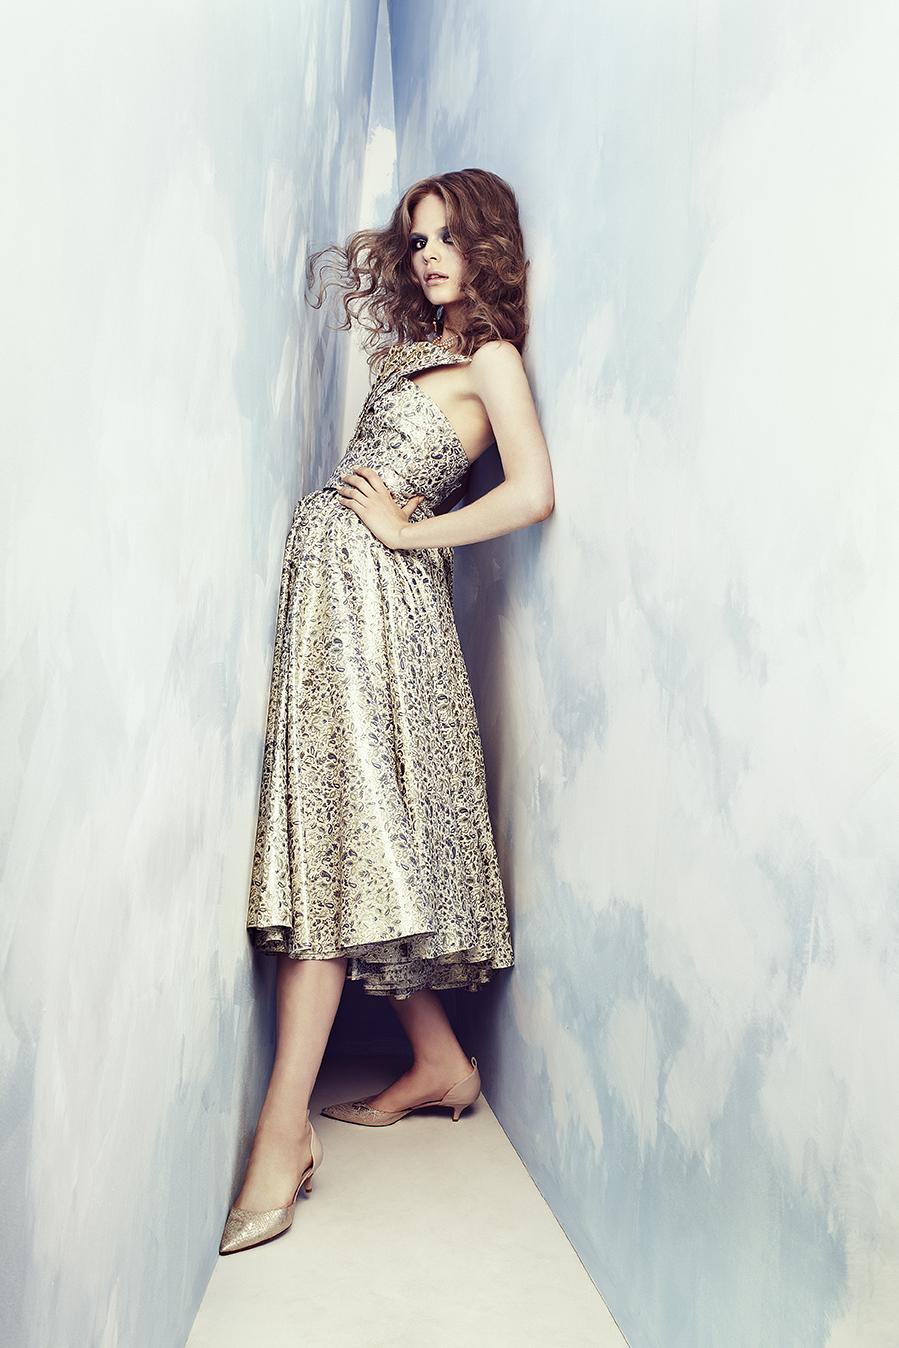 Dress by  Katayoon London ; Shoes by  Dune ; Earrings by  Jolita ; Necklace stylist's own